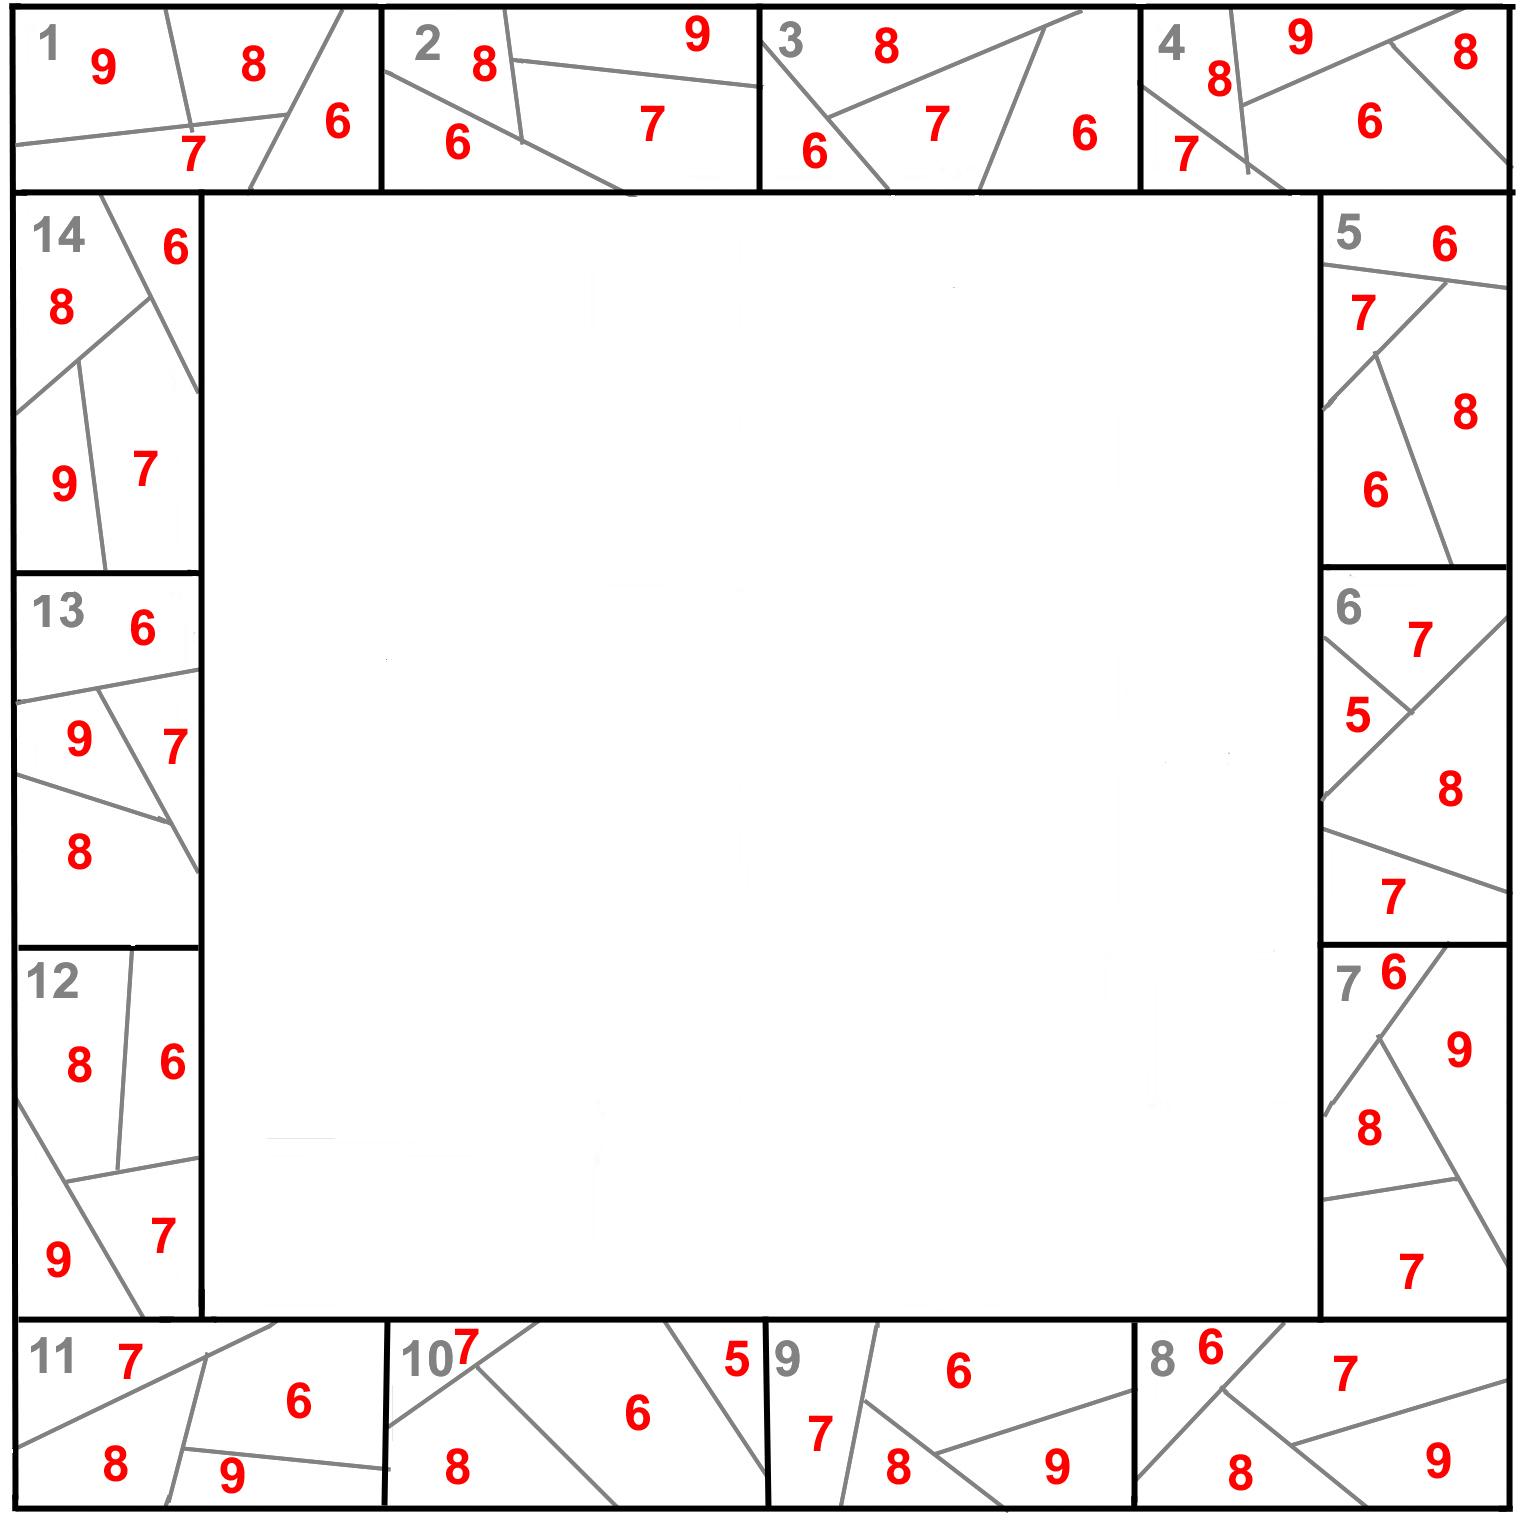 http://1.bp.blogspot.com/-GHCnRe_XTrE/UHvKkS189_I/AAAAAAAAA6c/UYYTKhul4z8/s1600/border+1+colour+by+numbers.jpg